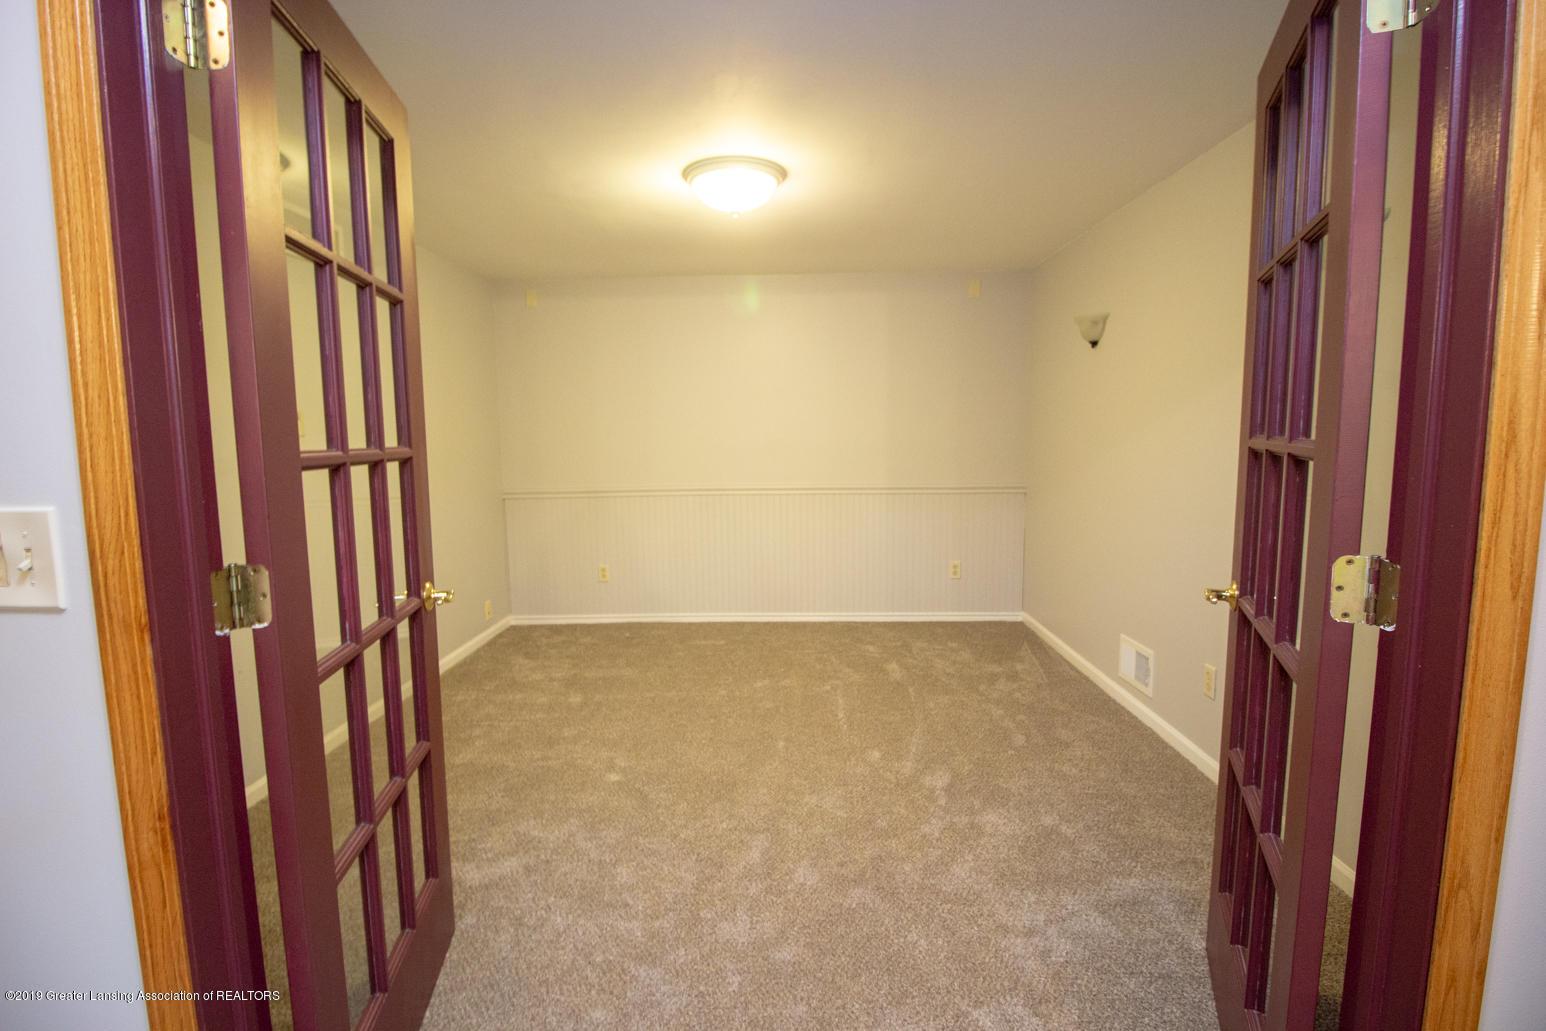 5891 Zimmer Rd - IMG_9843 - 6